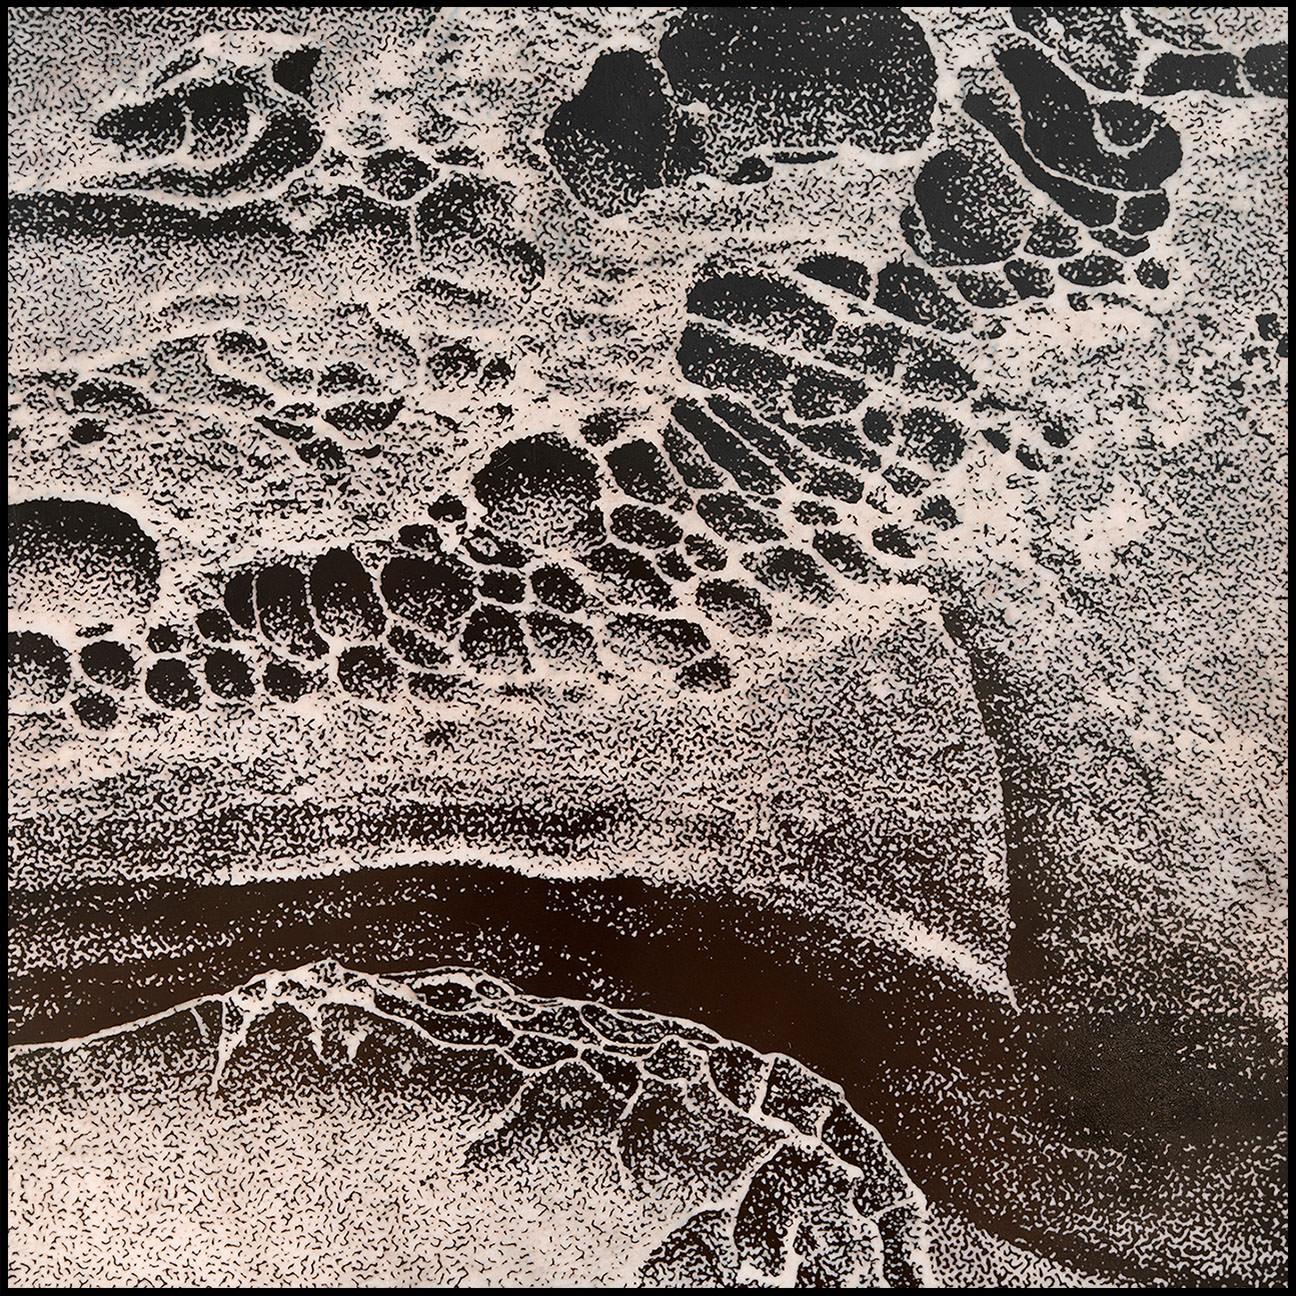 """Salt Point Tafoni #5"", champlevé enamel on copper, 8"" x 8"""